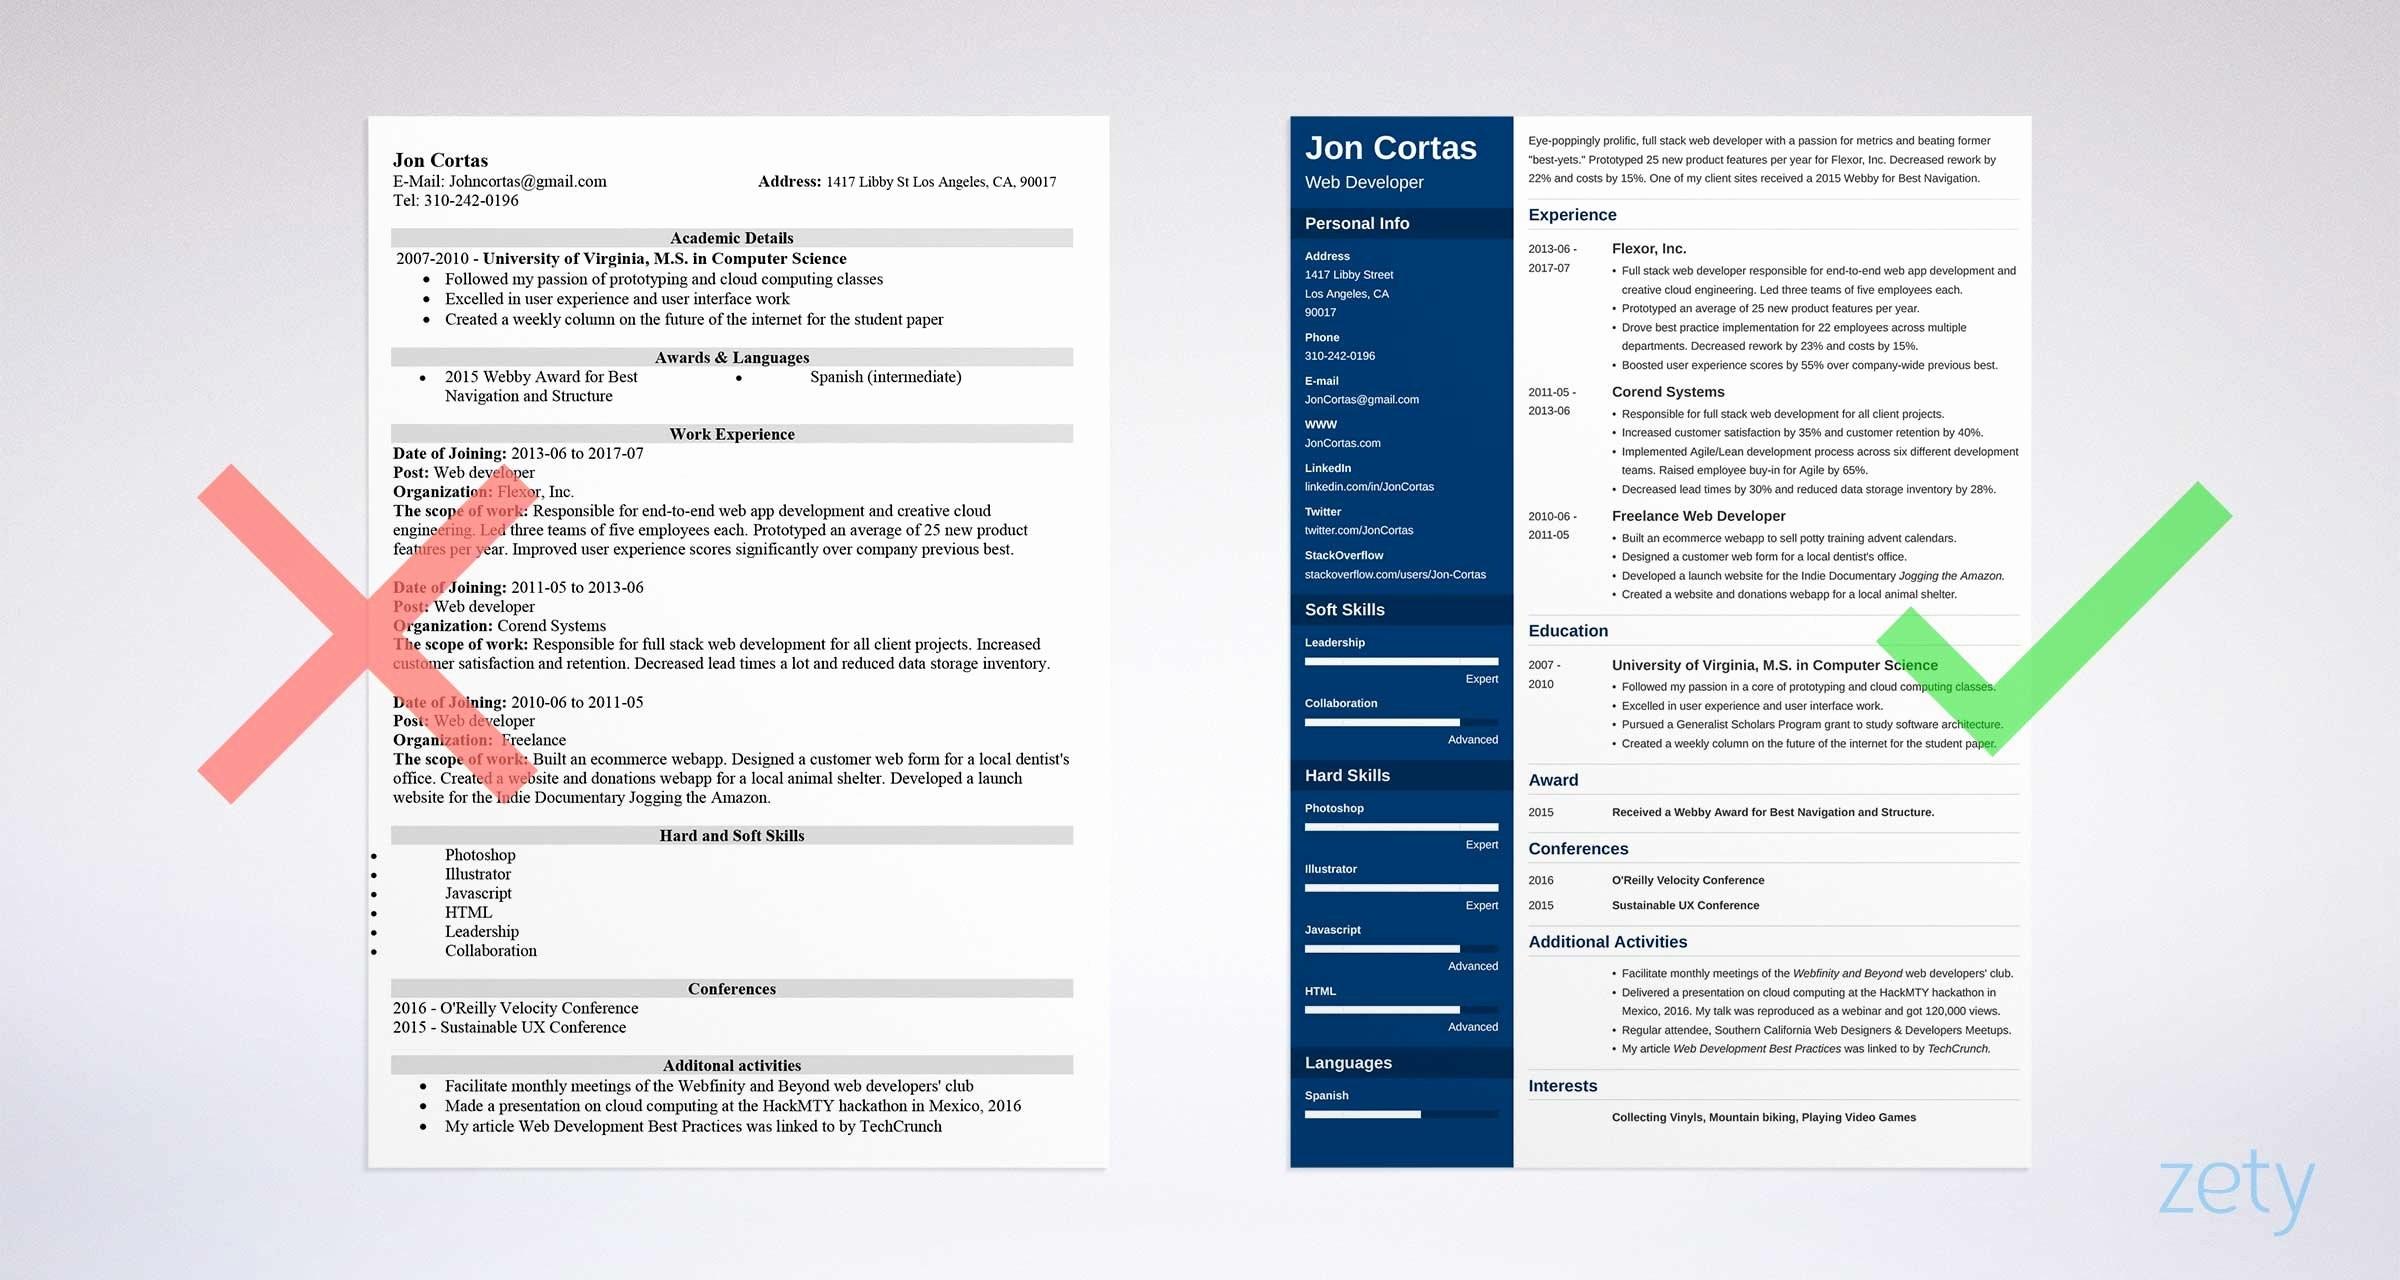 Free Resume Templates Download Word Fresh Free Resume Templates for Word 15 Cv Resume formats to